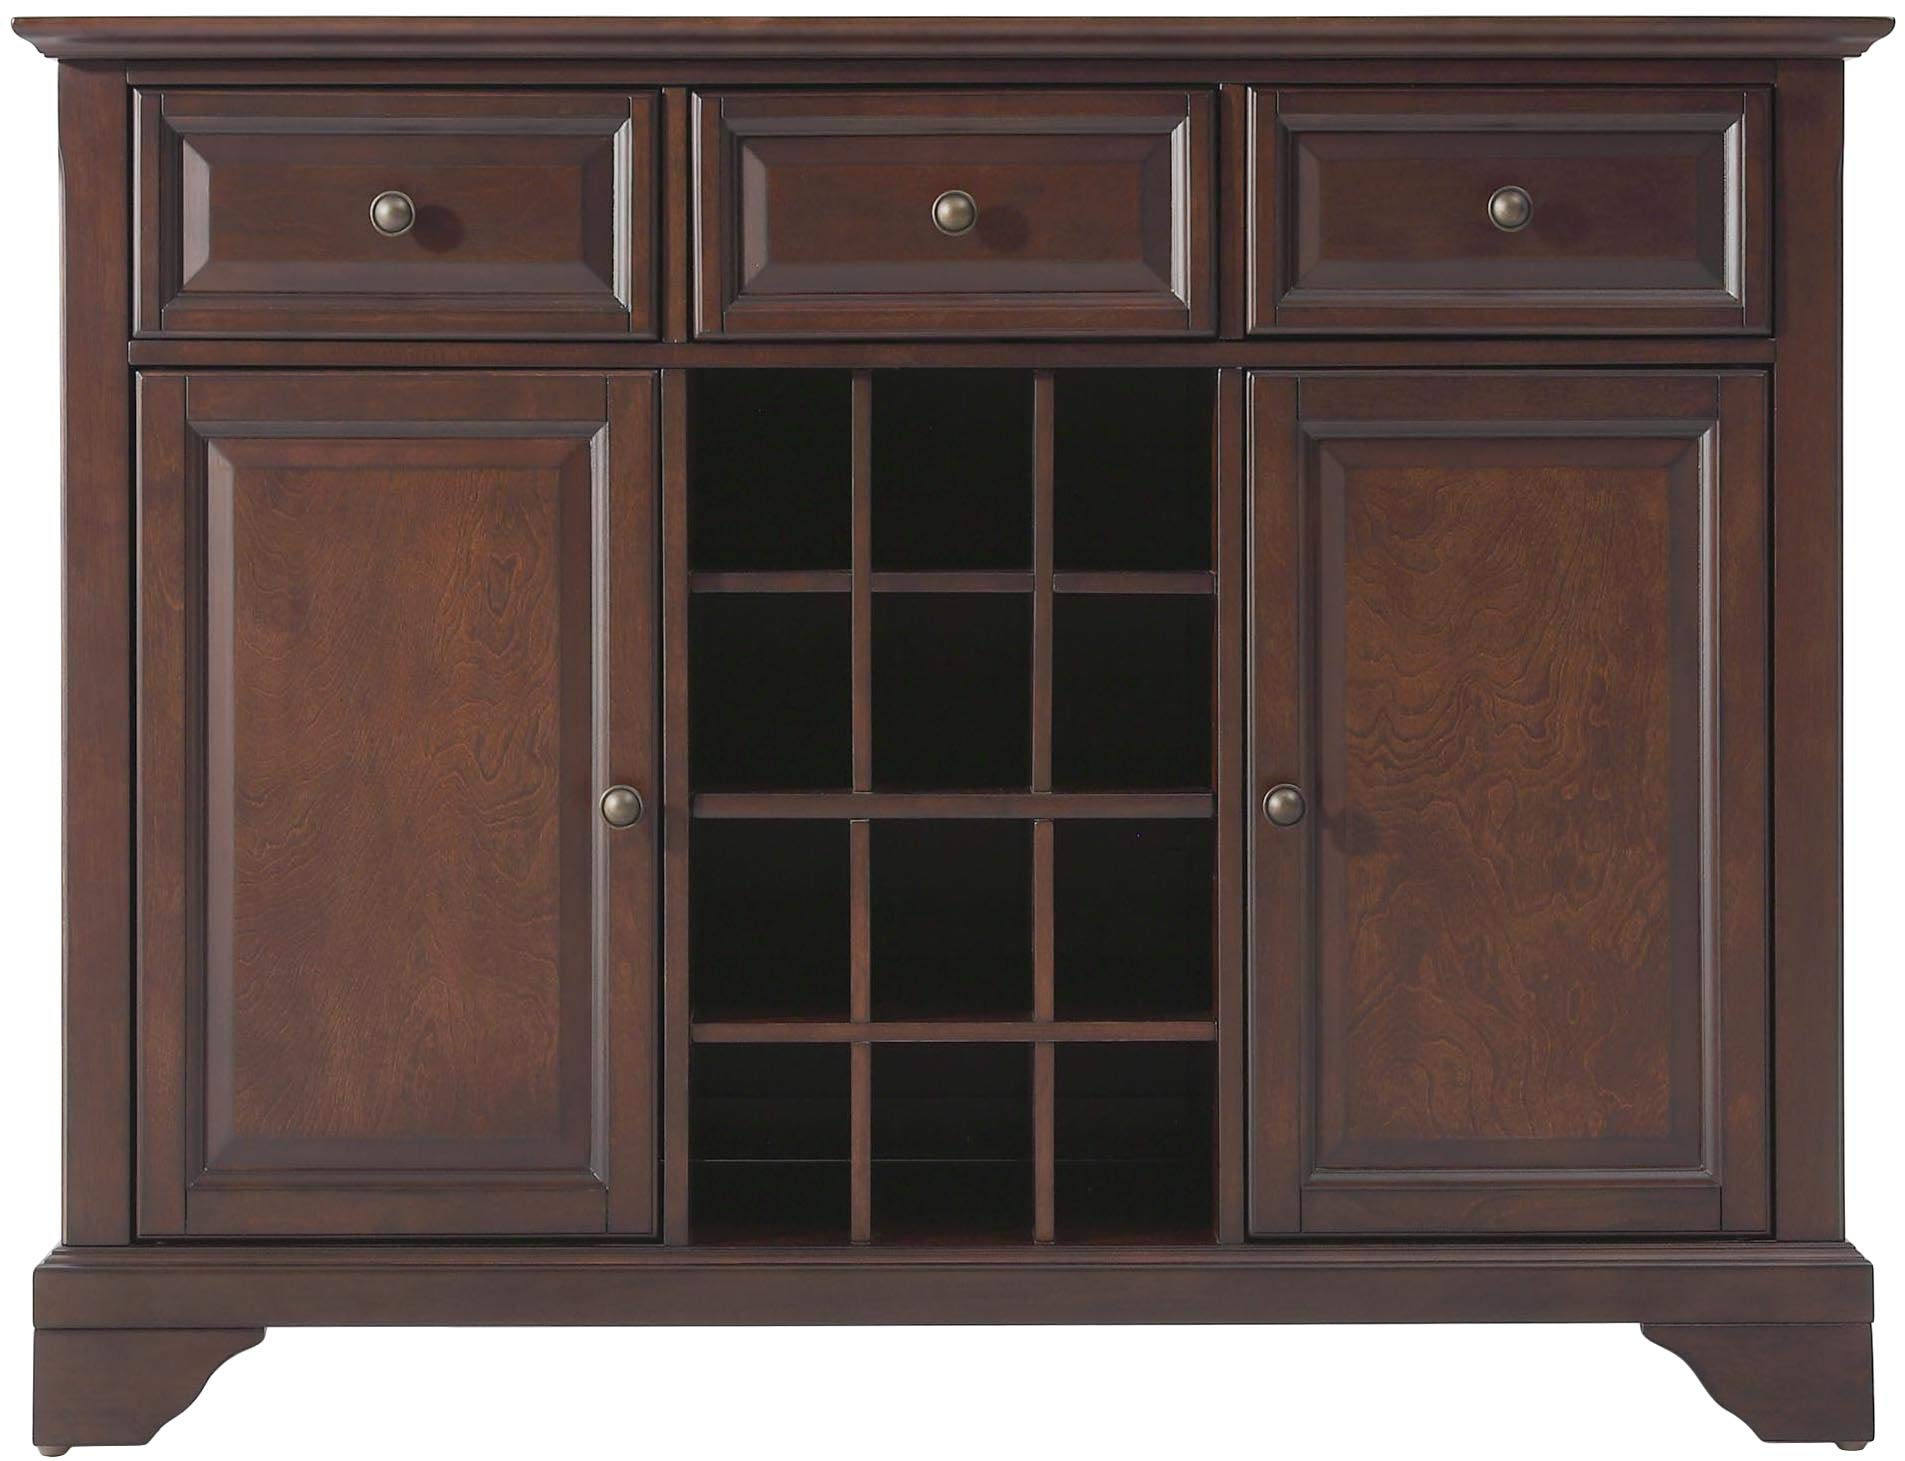 Crosley Furniture LaFayette Wine Buffet / Sideboard - Vintage Mahogany by Crosley Furniture (Image #1)